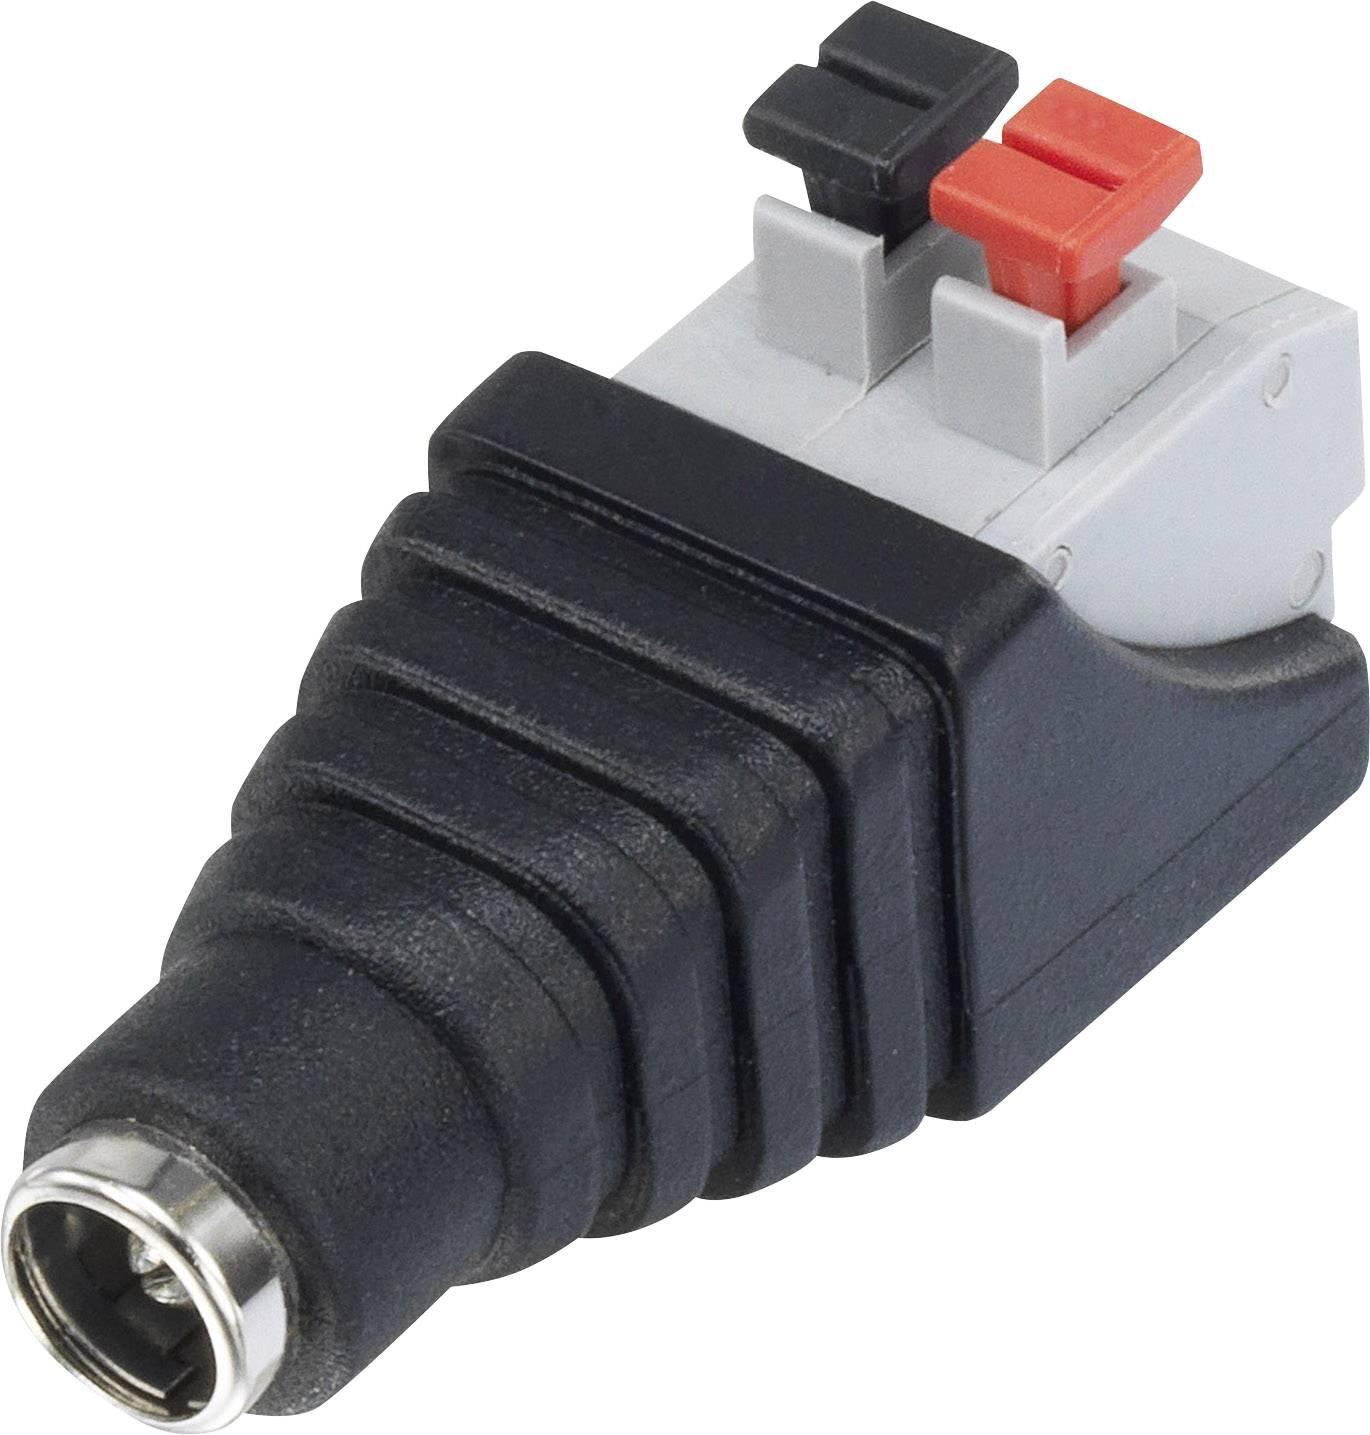 Conrad Components Niedervolt-Adapter Niedervolt-Stecker USB 2.0 Buchse A 5 mm 2.1 mm 1 St.